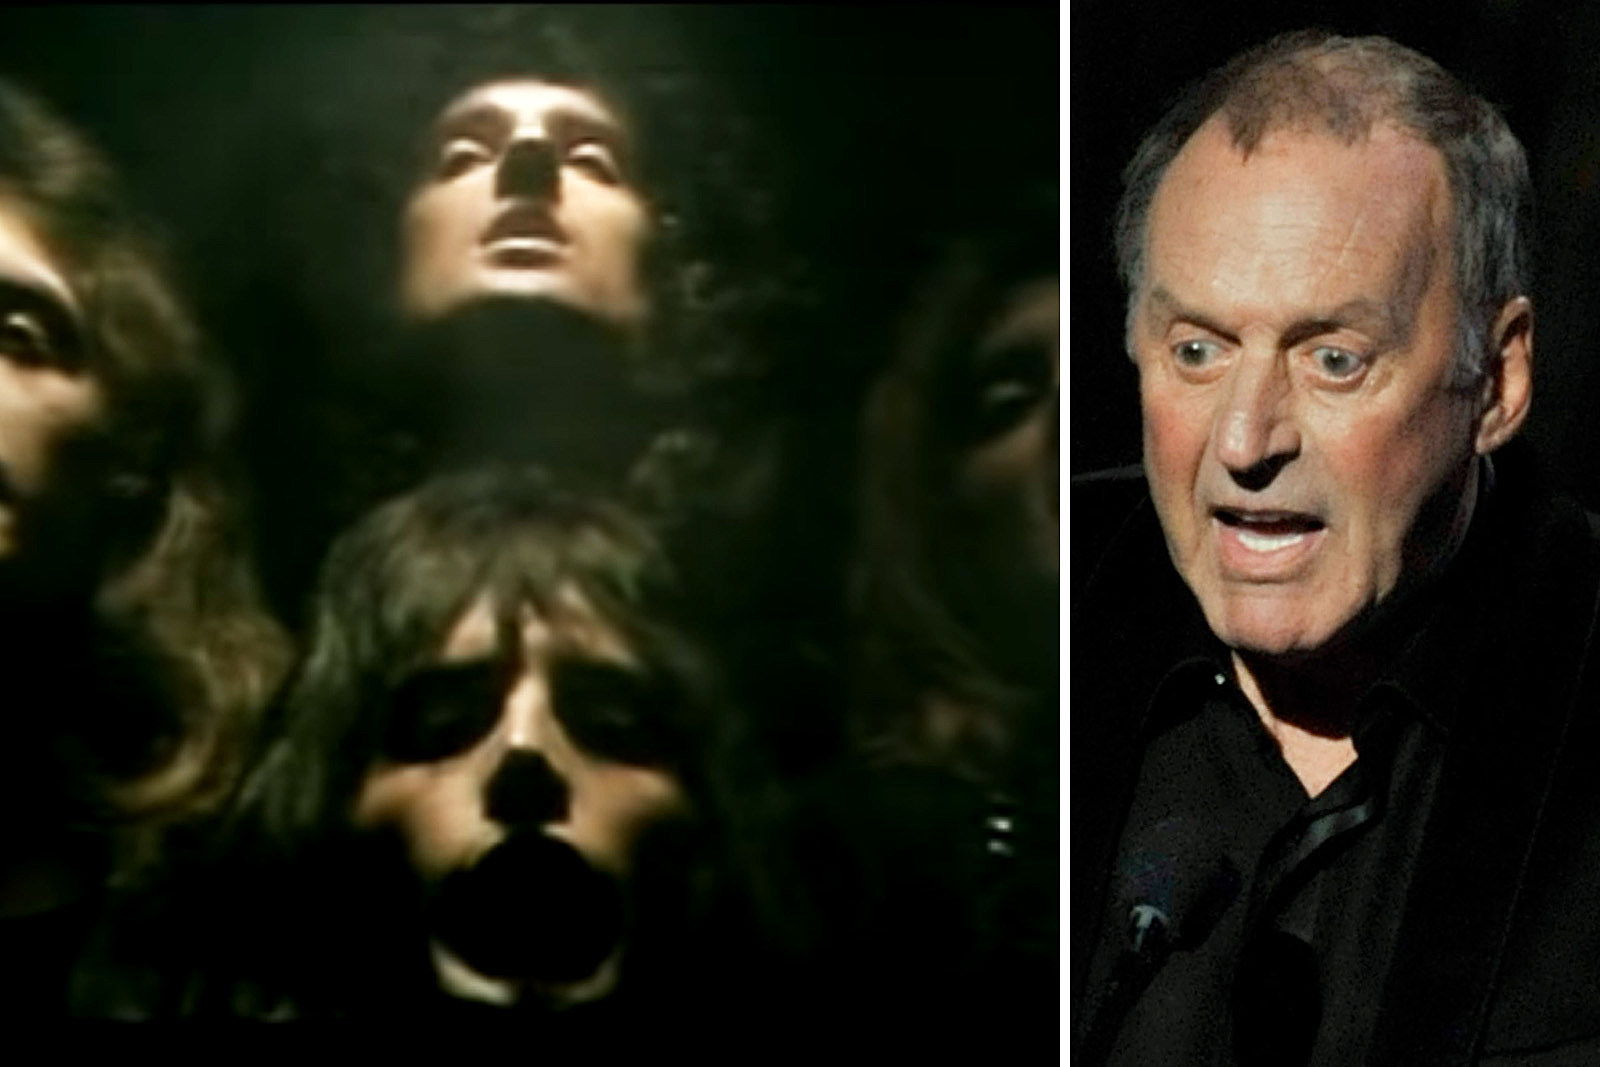 Director of Queen's 'Bohemian Rhapsody' Video Considers Lawsuit